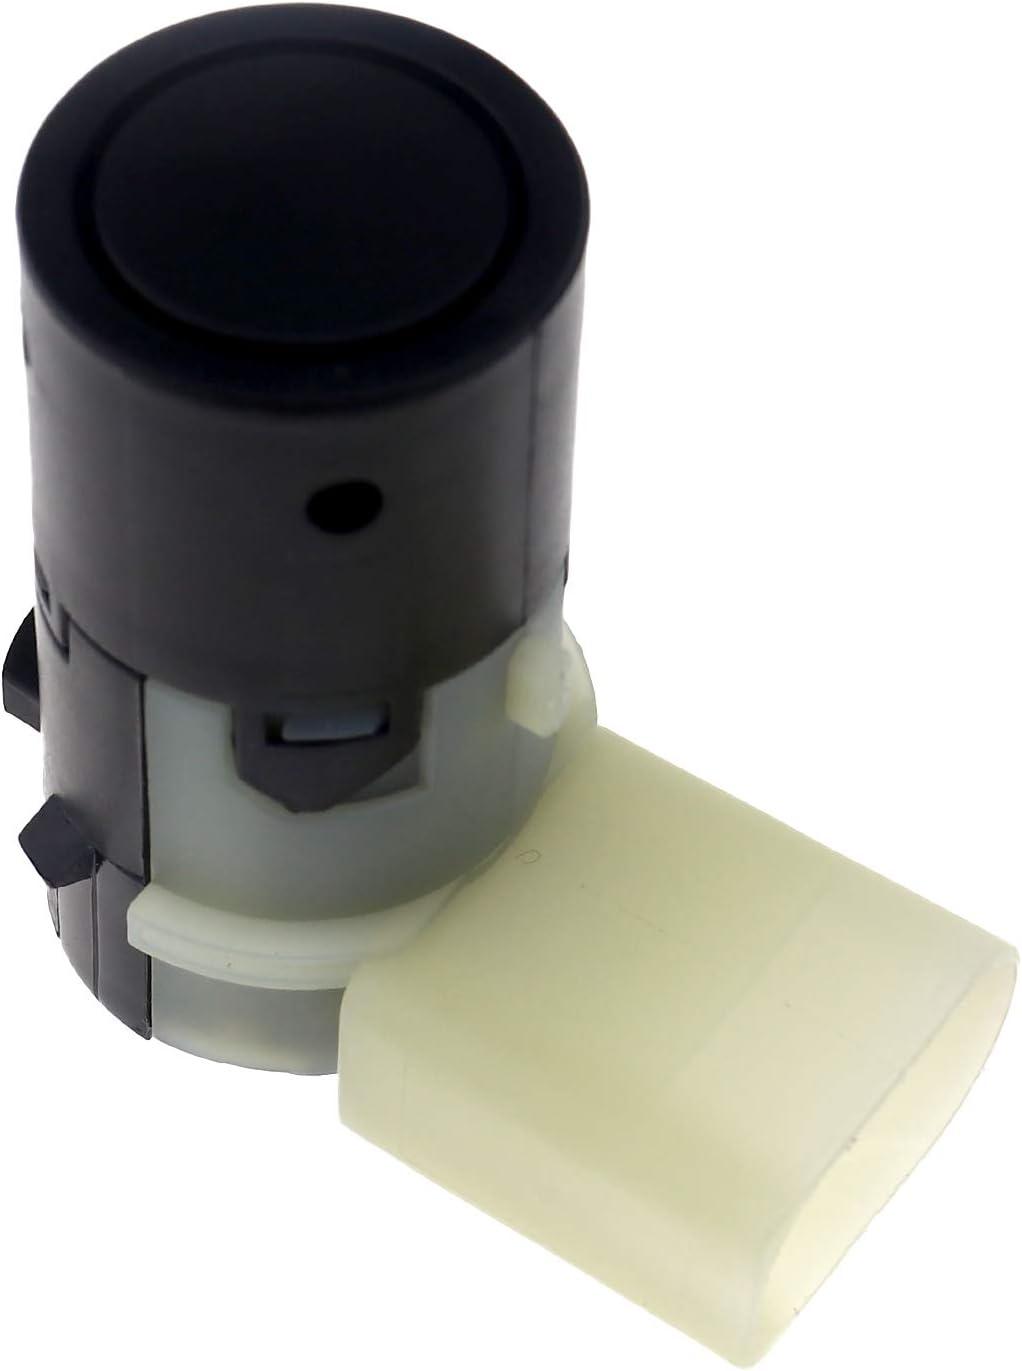 2pcs Rear Car Parking Sensor for VW Audi A2 A4 A6 A8 Skoda Octavia 7H0919275C